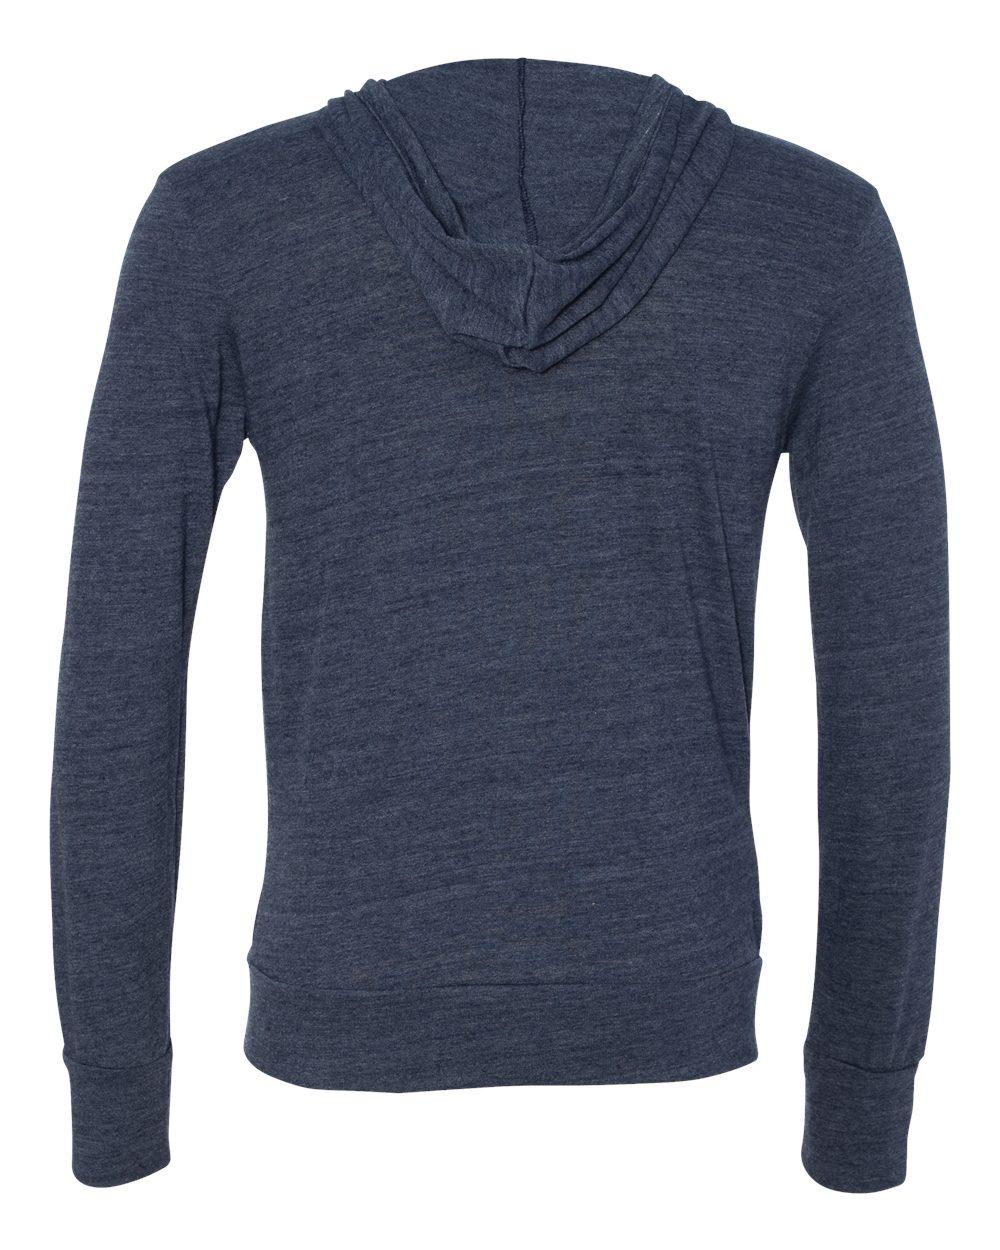 Alternative-Mens-Eco-Jersey-Hooded-Full-Zip-T-Shirt-Blank-Plain-1970e1-up-to-3XL miniature 16